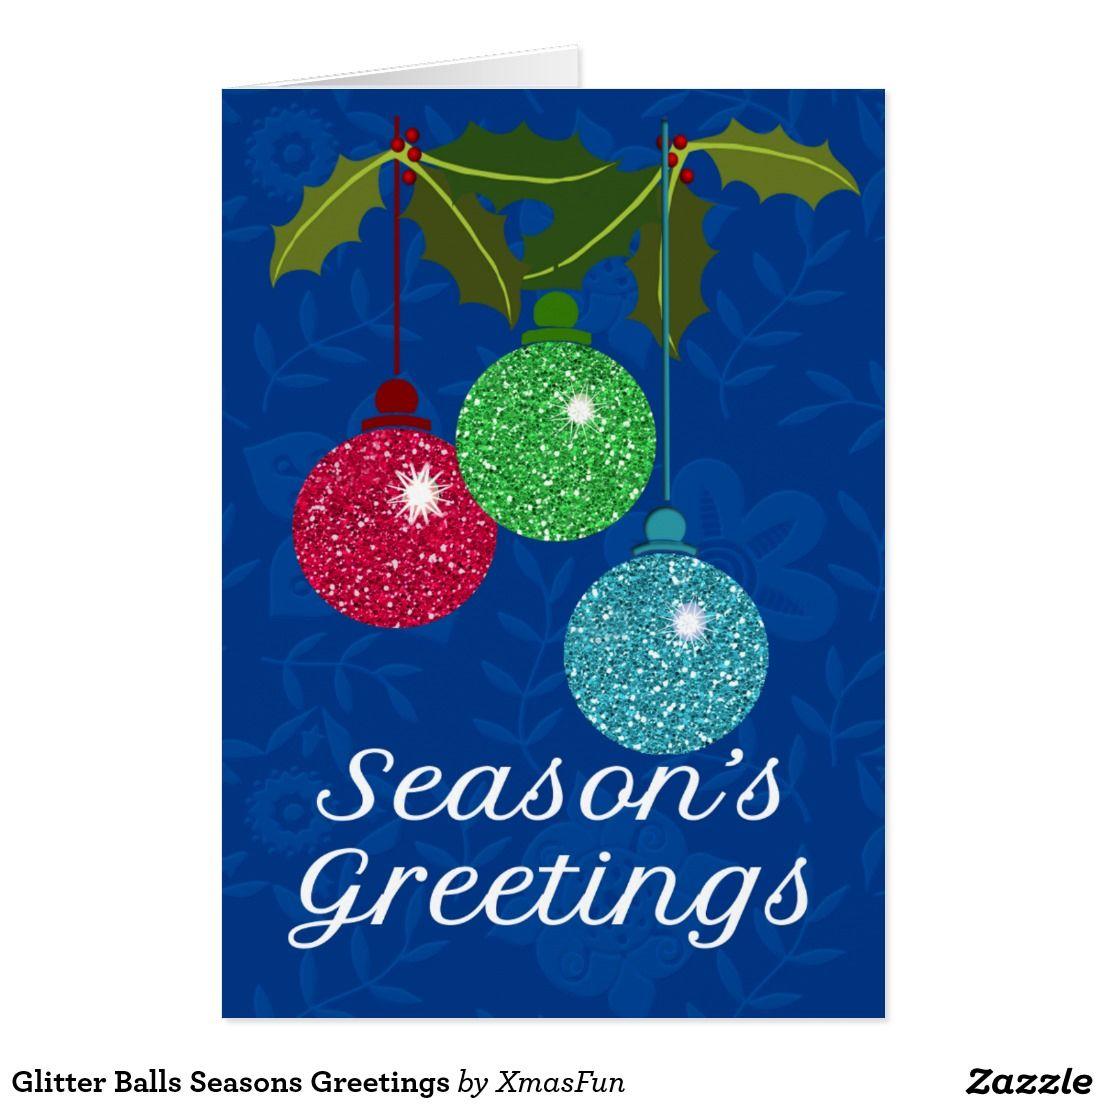 Glitter Balls Seasons Greetings Card | Christmas and Holiday Cards ...